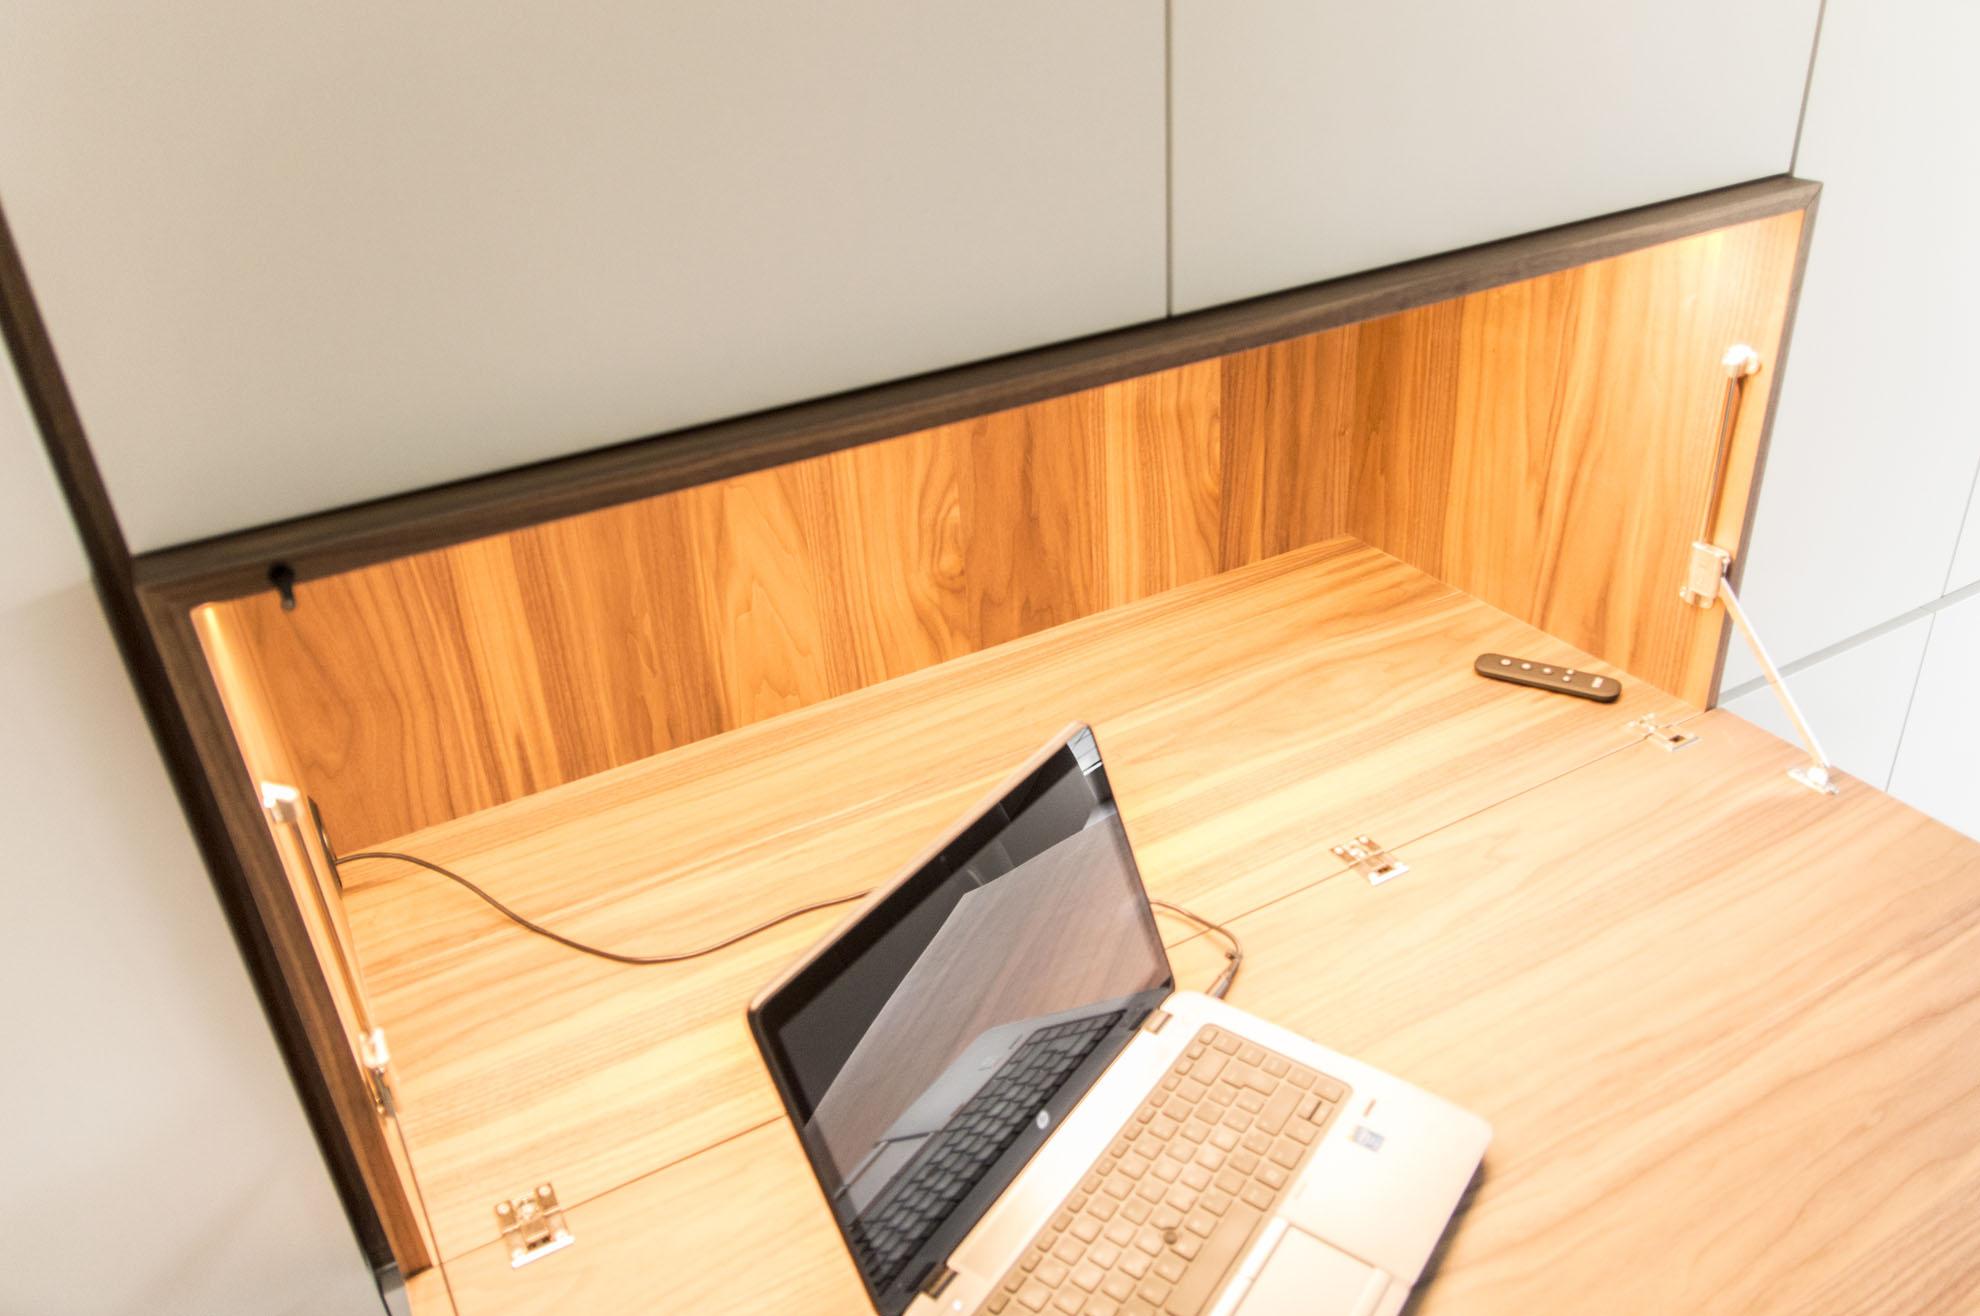 Hus Interieur - Portfolio - Maatwerk - Bureau